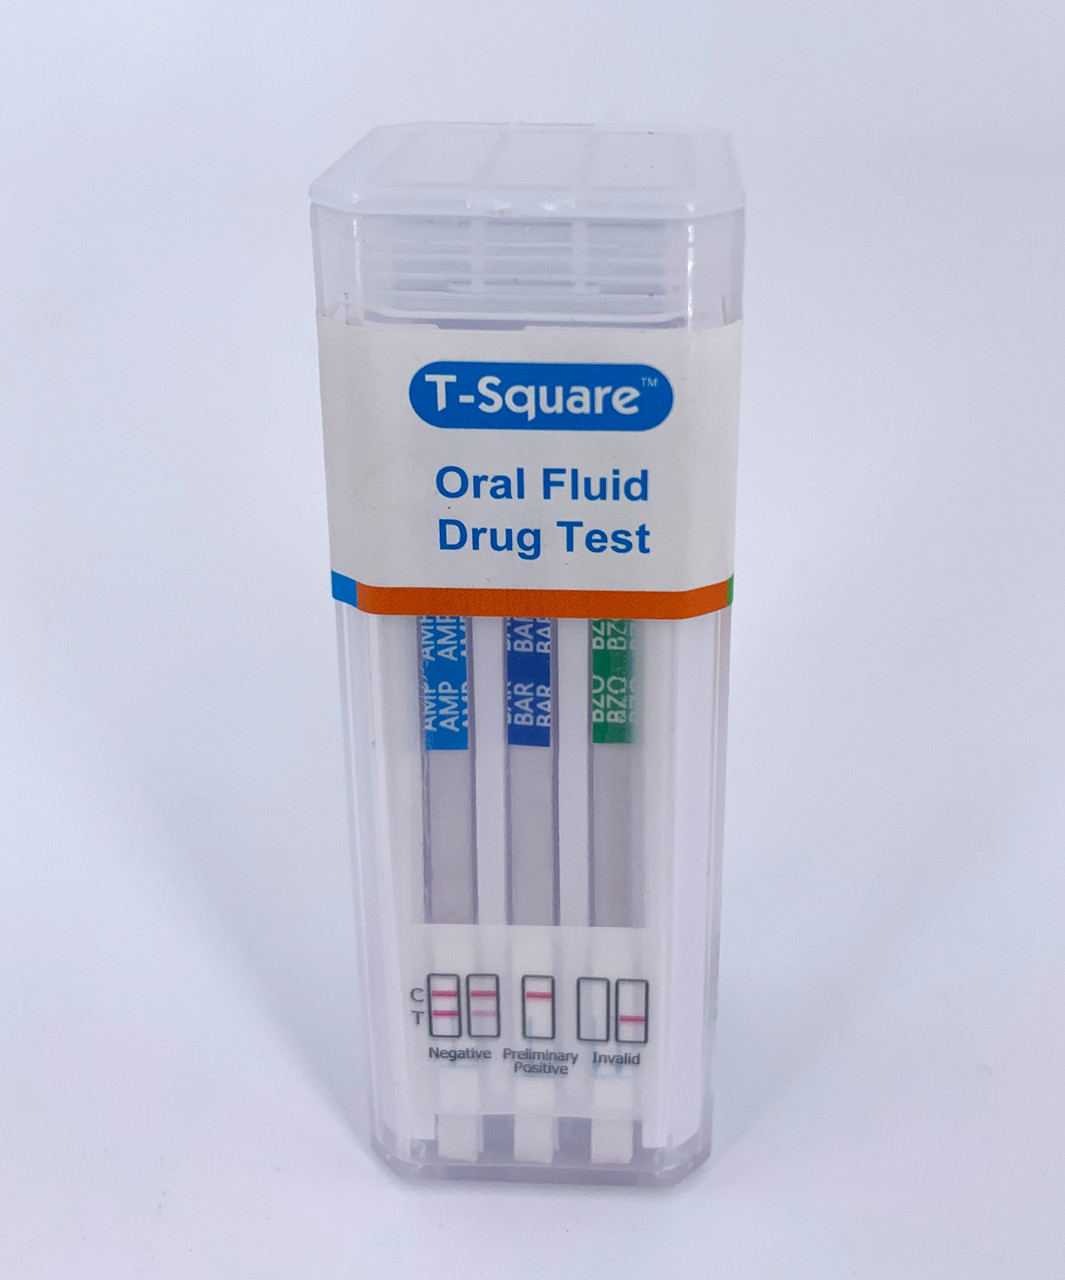 5 Panel T-Square Oral Fluid Drug Test with Saliva Indicator Front